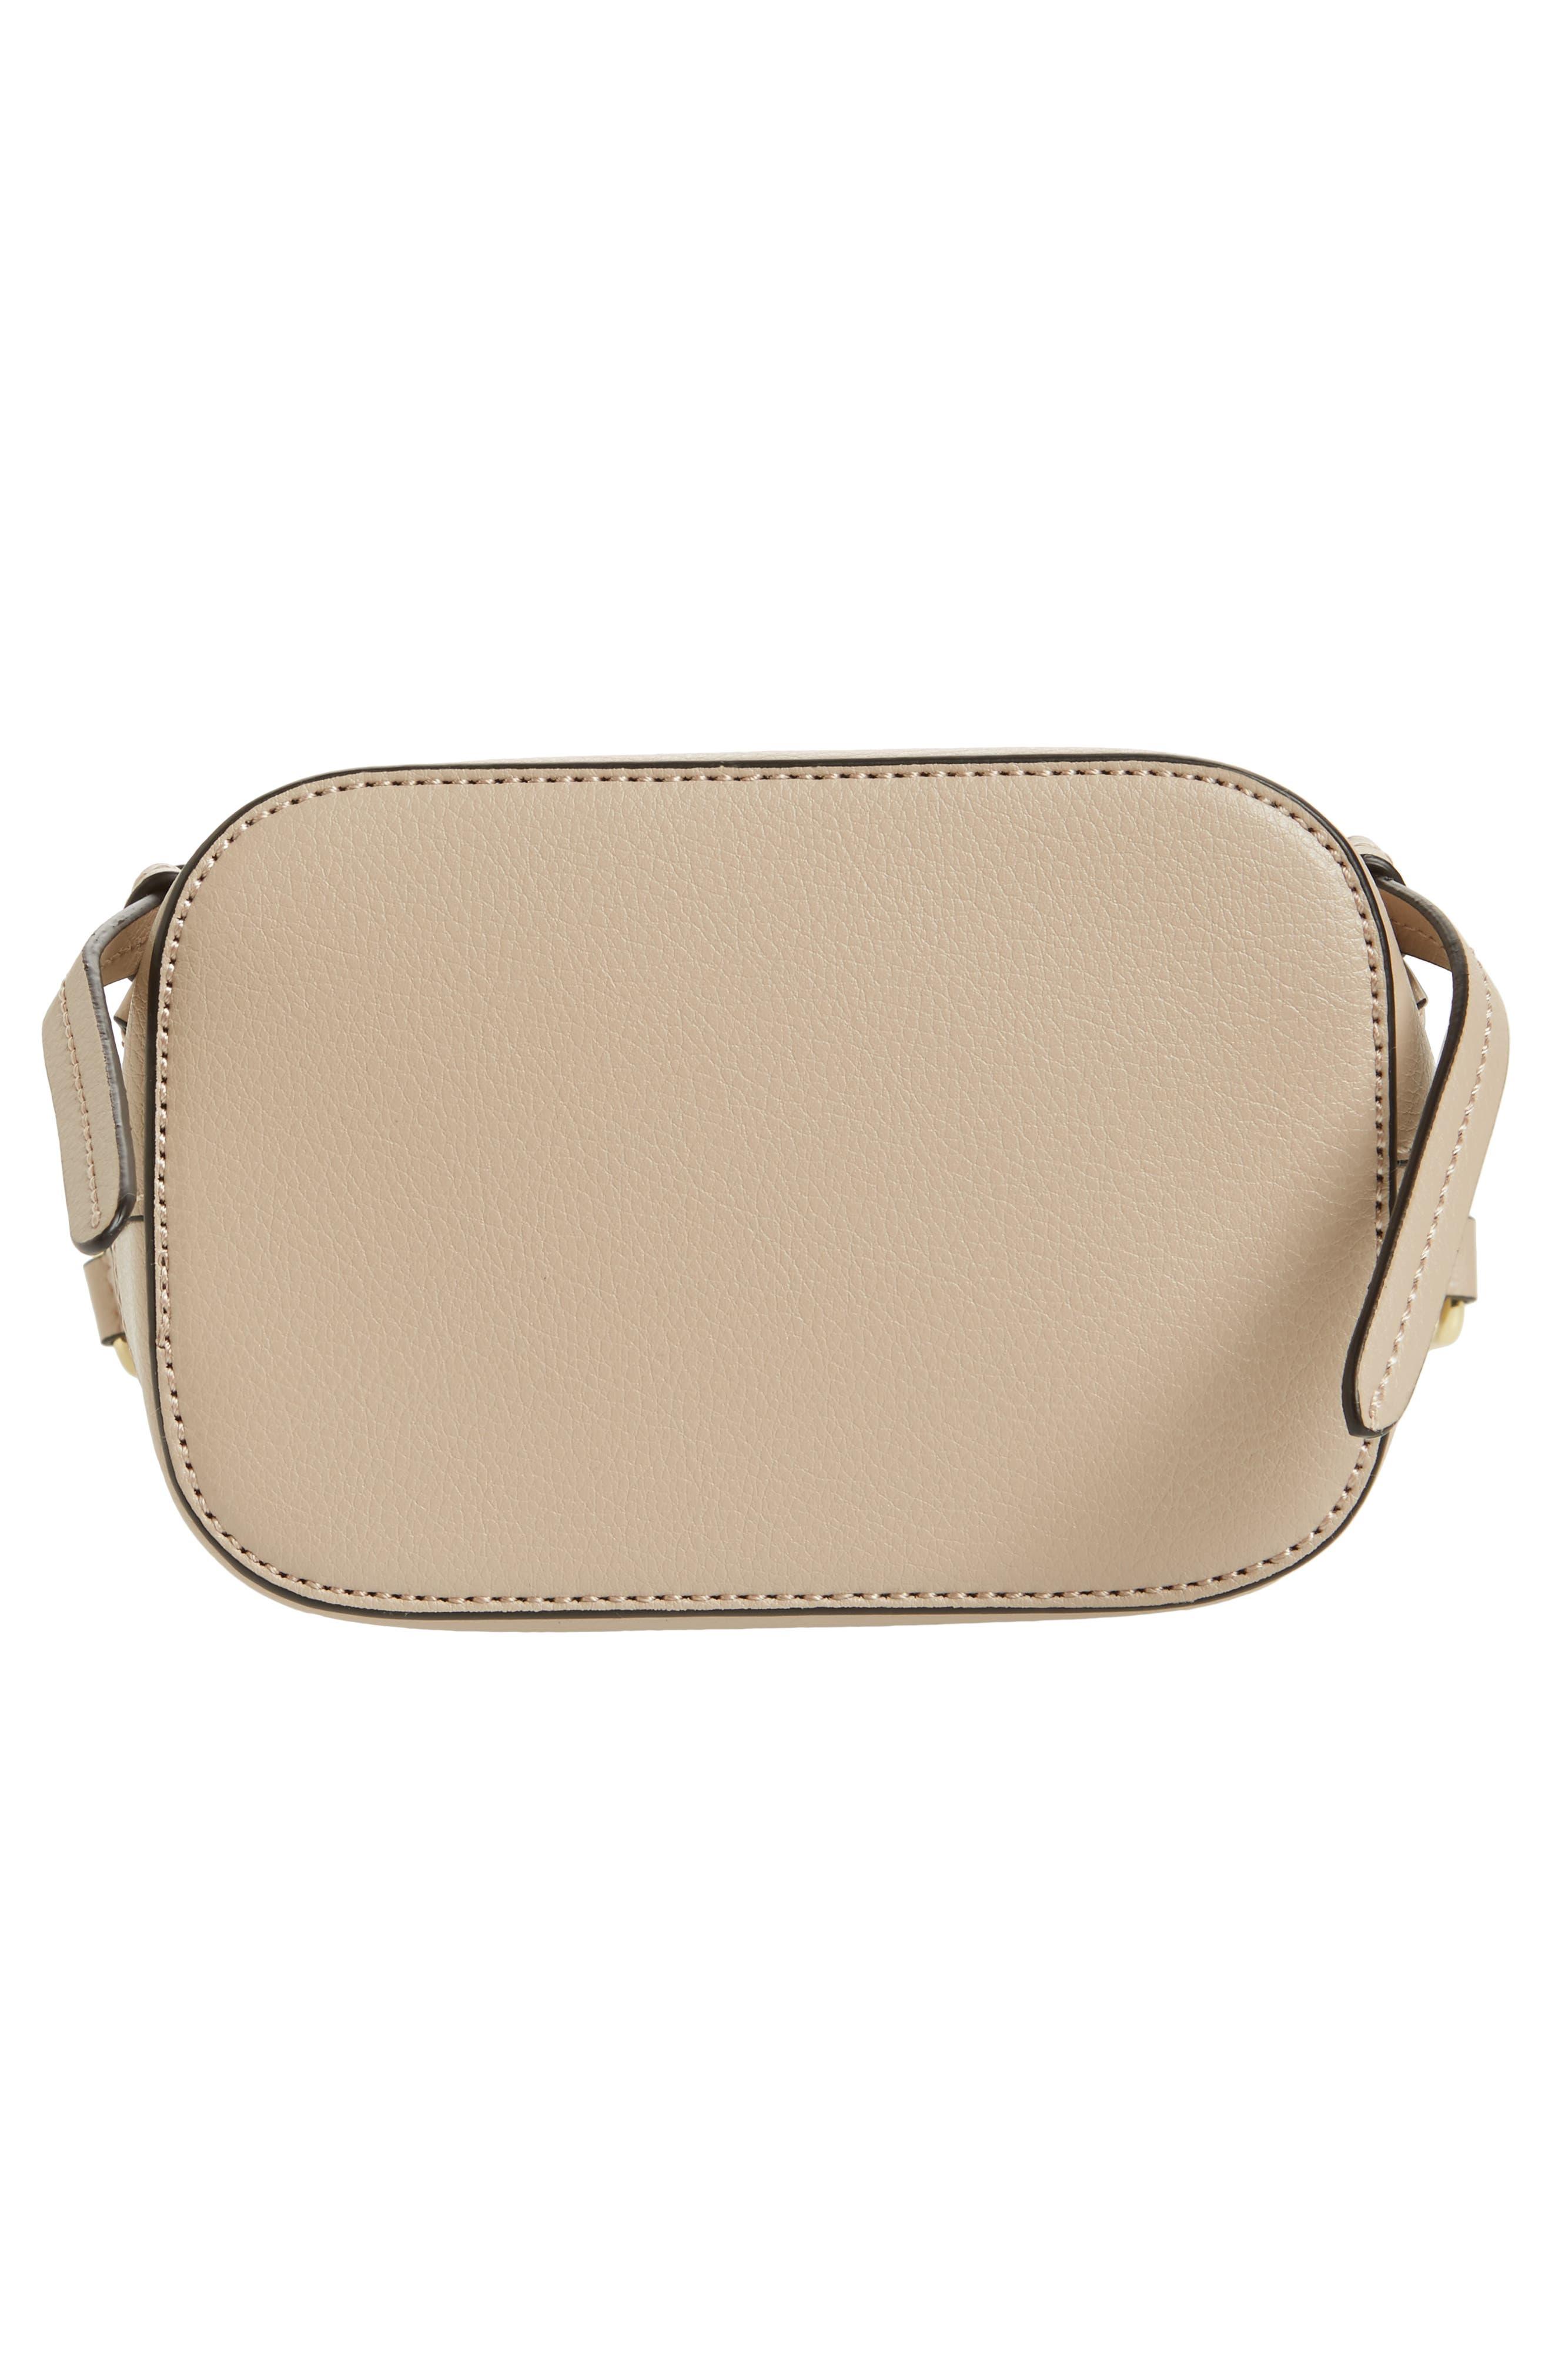 Beckett Leather Crossbody Bag,                             Alternate thumbnail 6, color,                             250